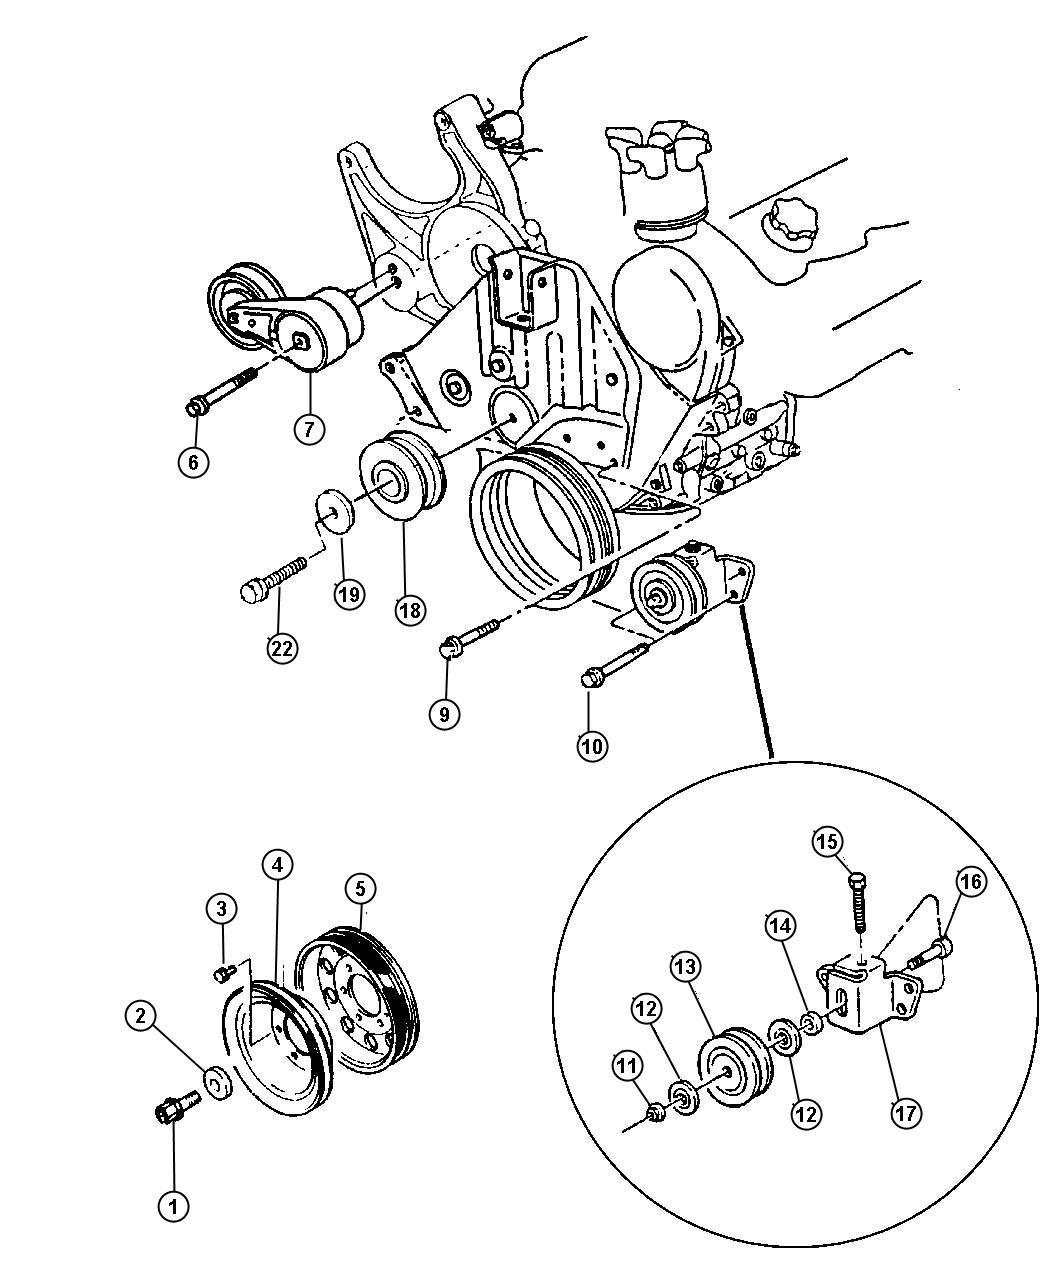 Gimbal Naza Wiring Diagram Auto Electrical Dji Phantom Vision 2 Also Ladybird